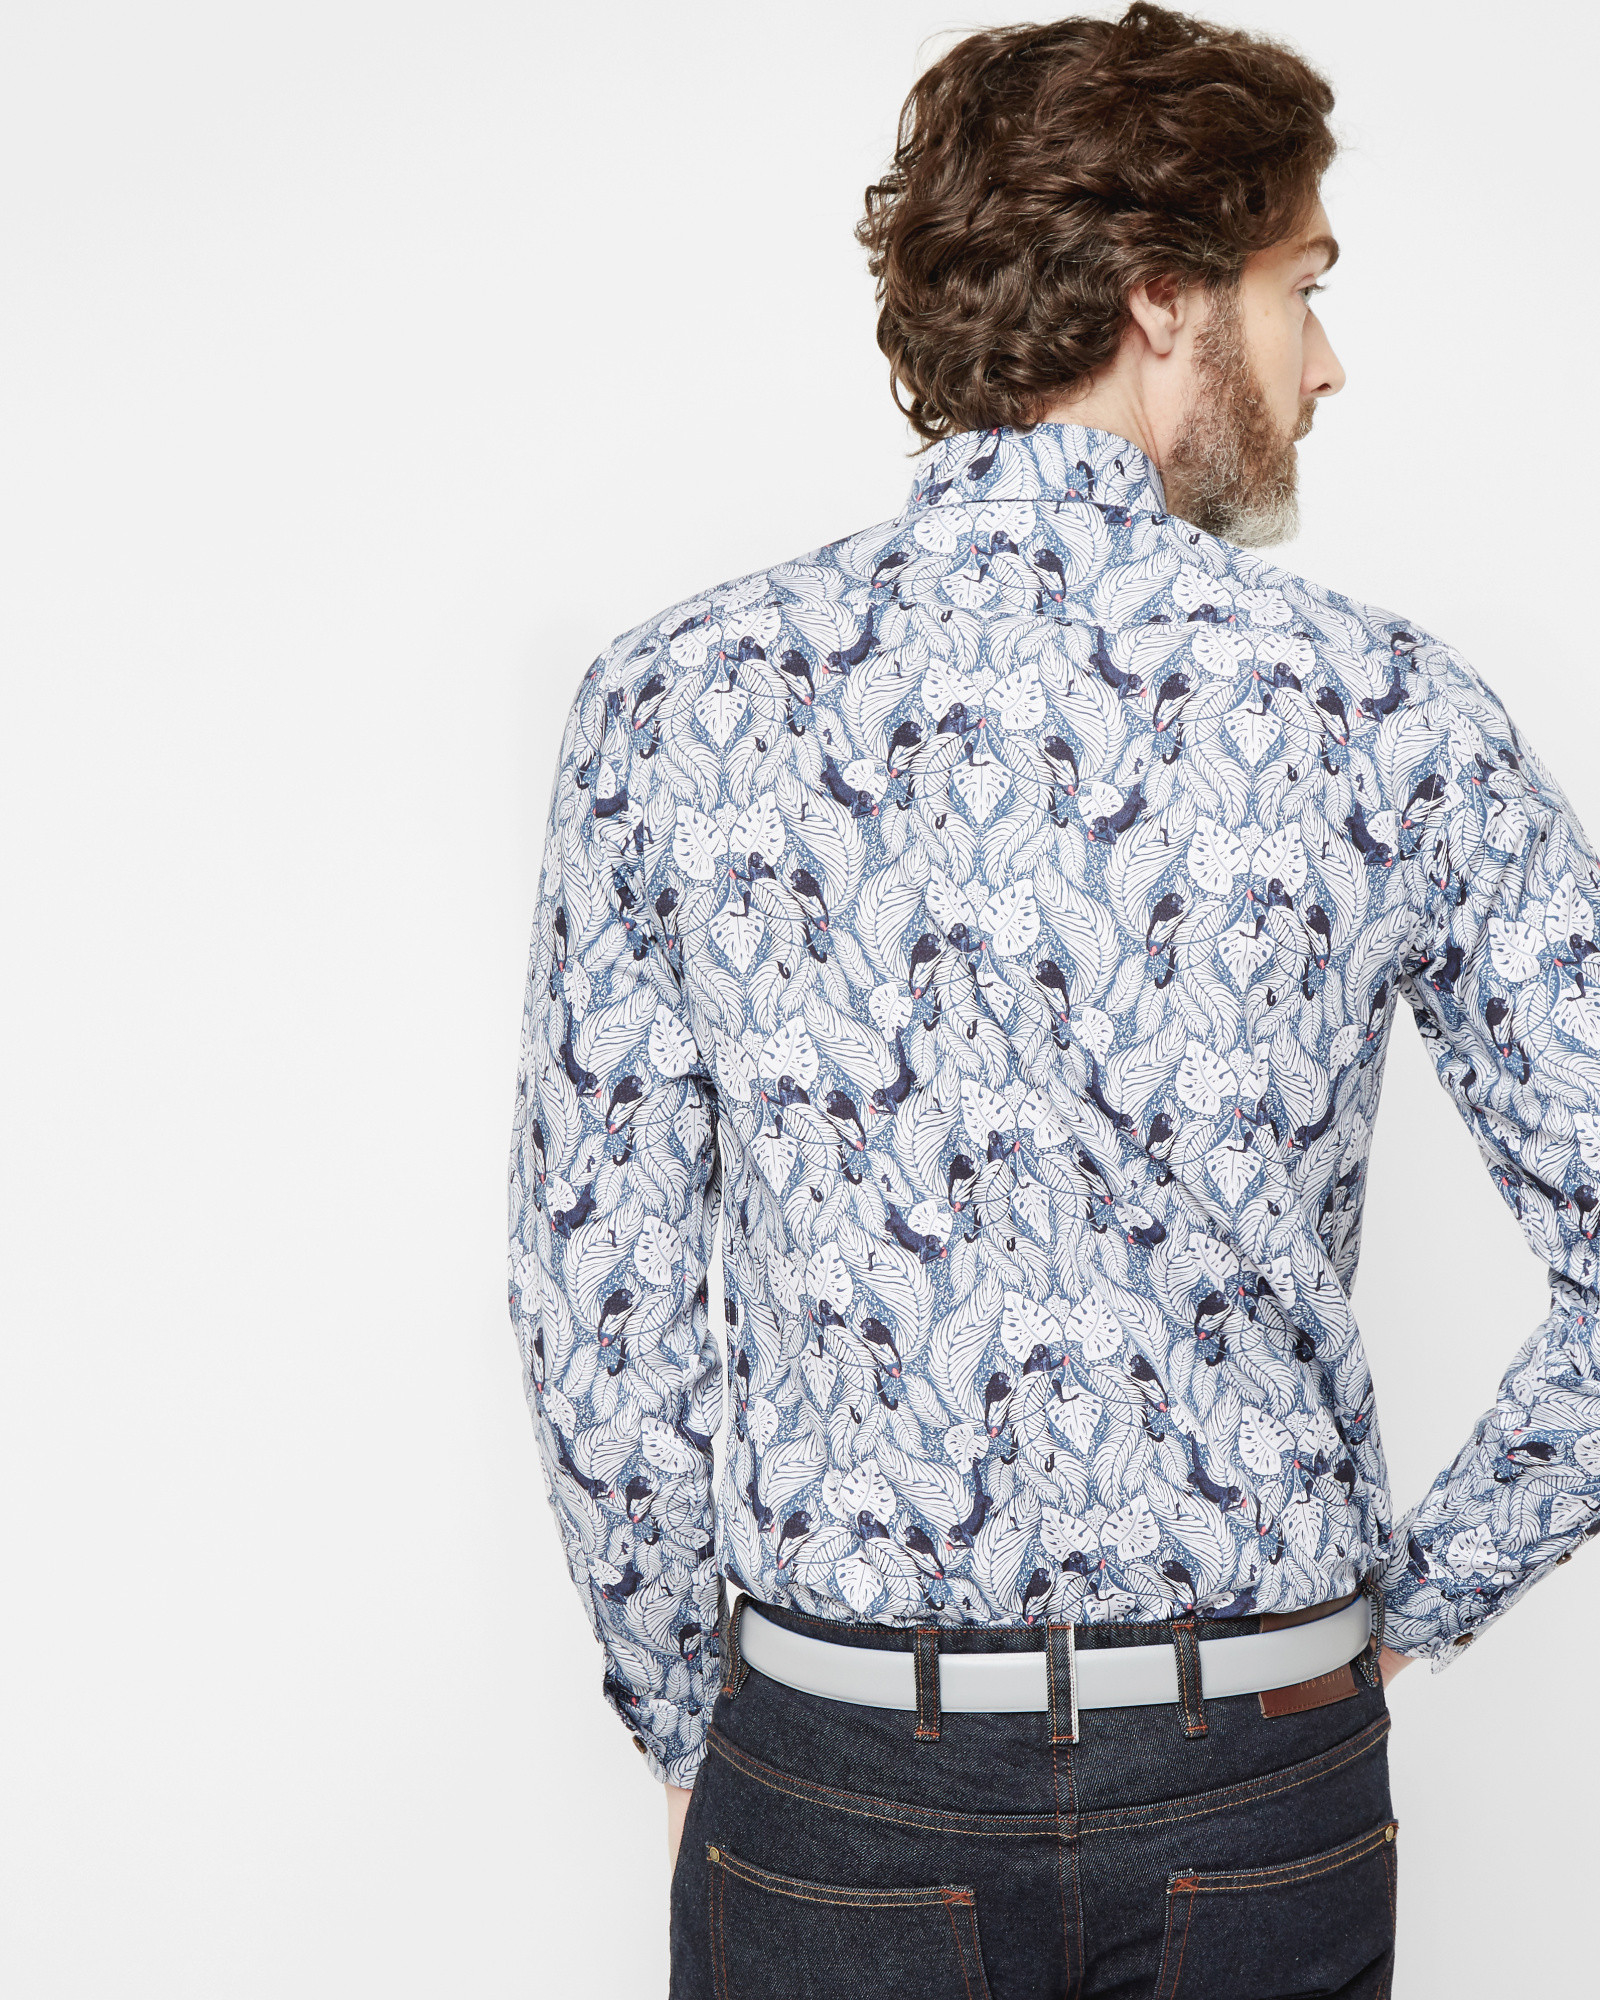 Ted Baker Monkey Print Cotton Shirt In Blue For Men Lyst